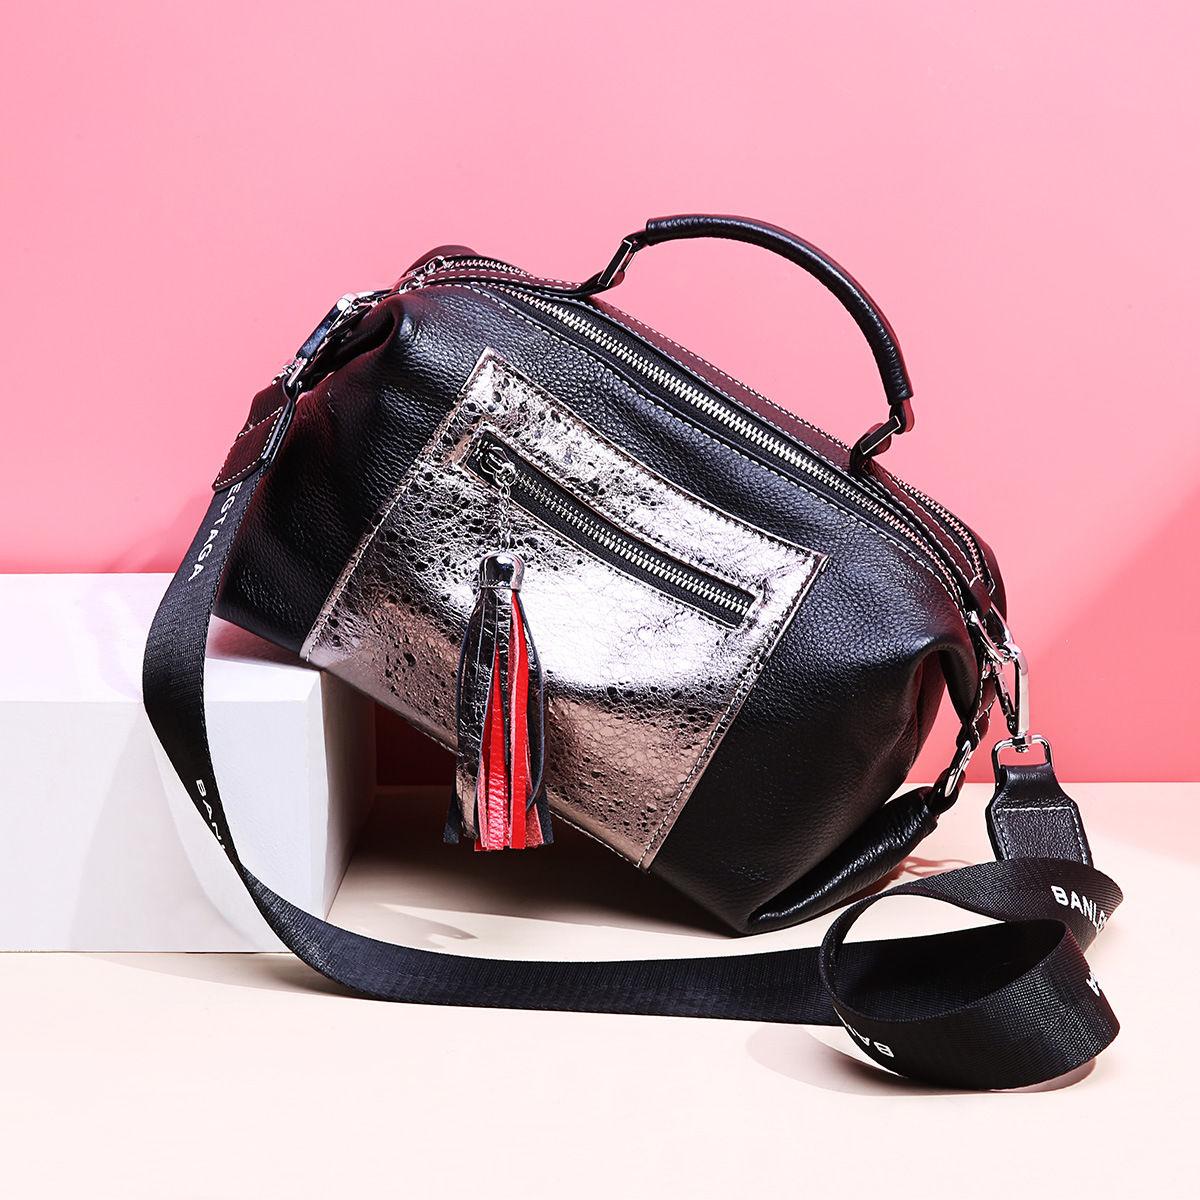 Metalic Silver Panelled Boston Bag Tassel Design 100 Genuine Leather Women Handbag Large Daily Purse Luxury